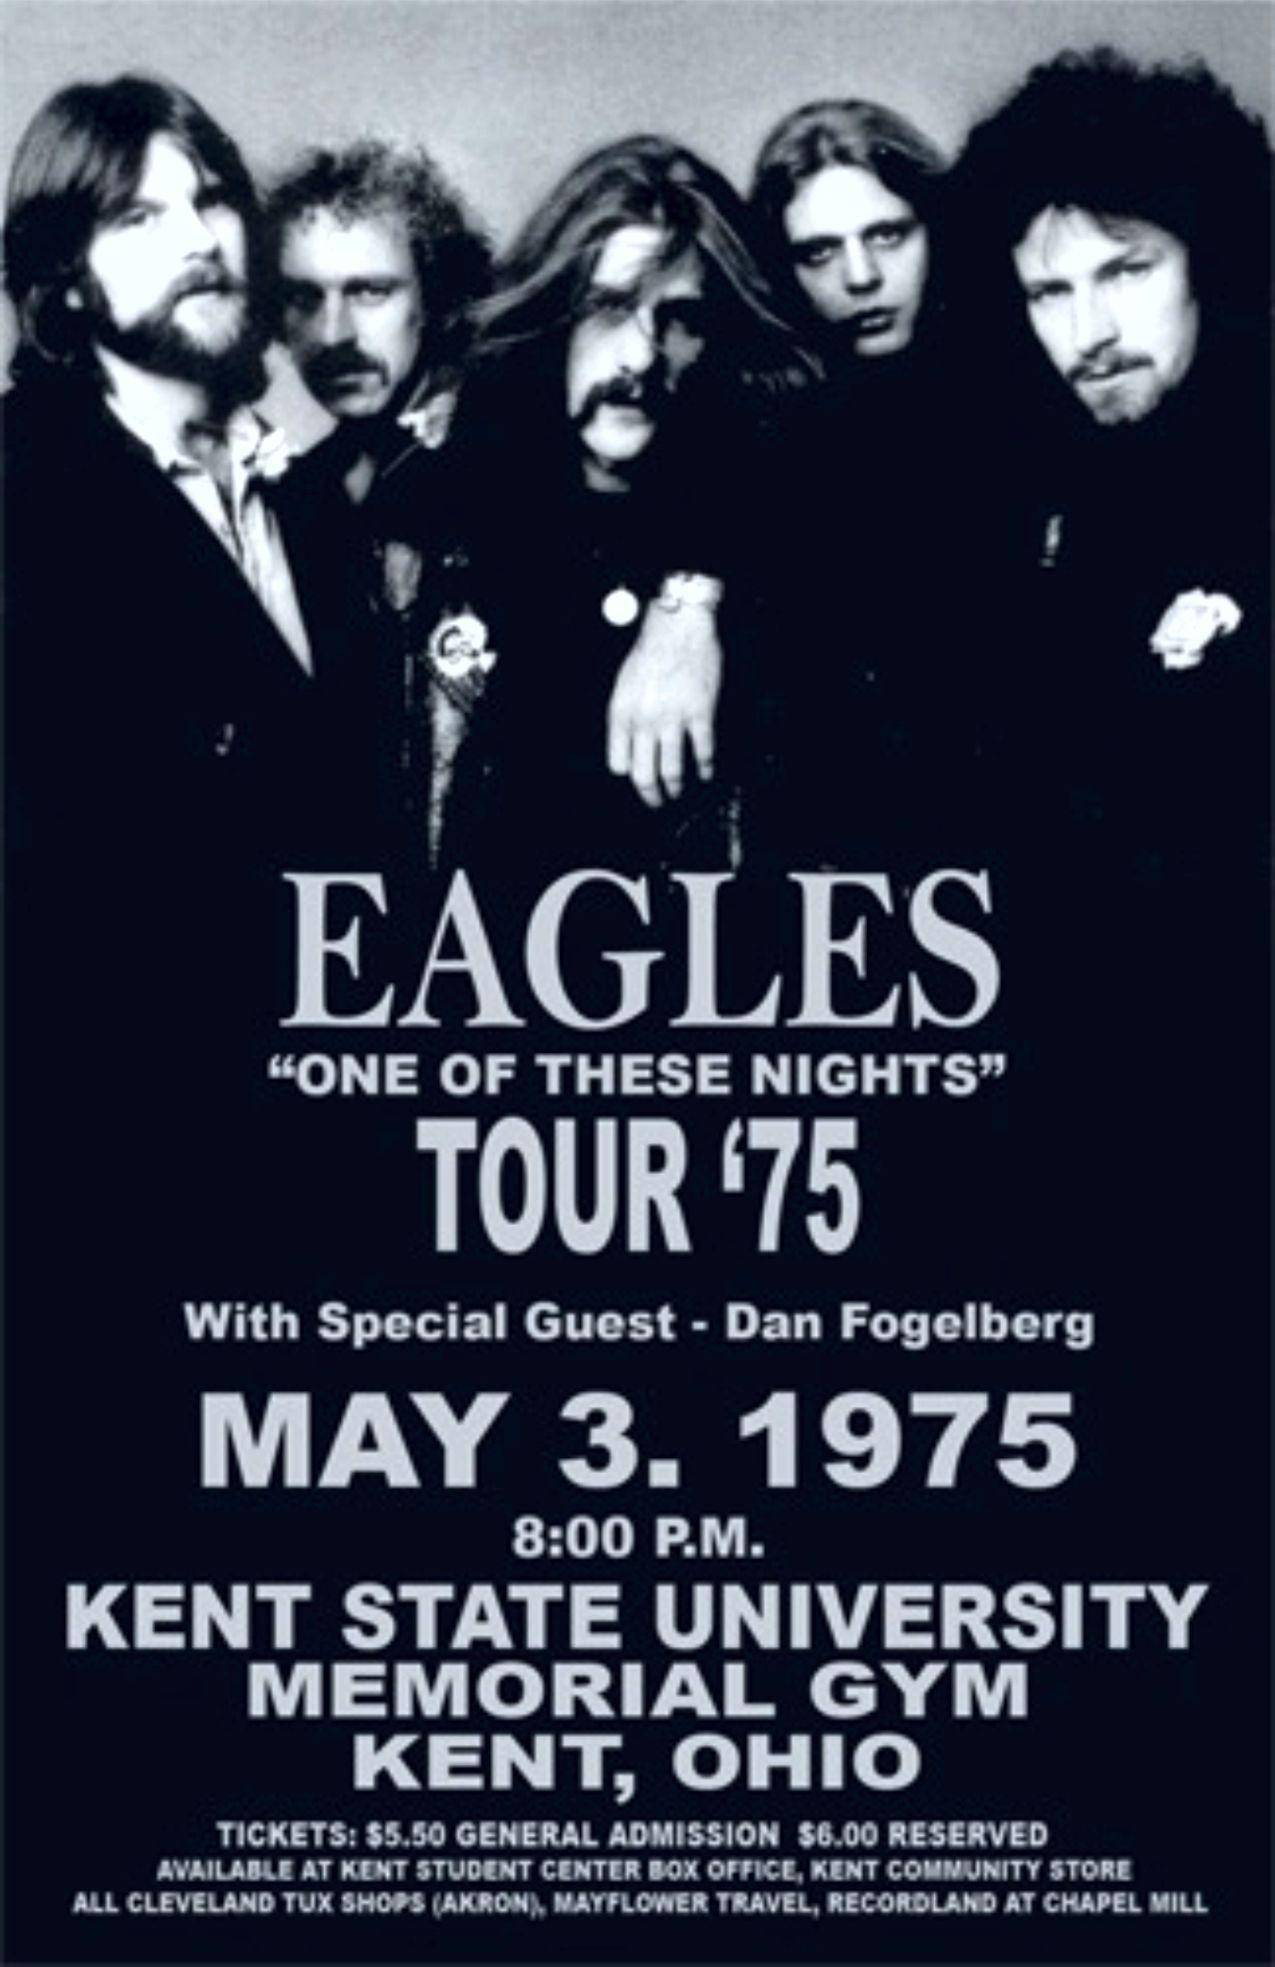 Eagles Band Iphone Wallpaper